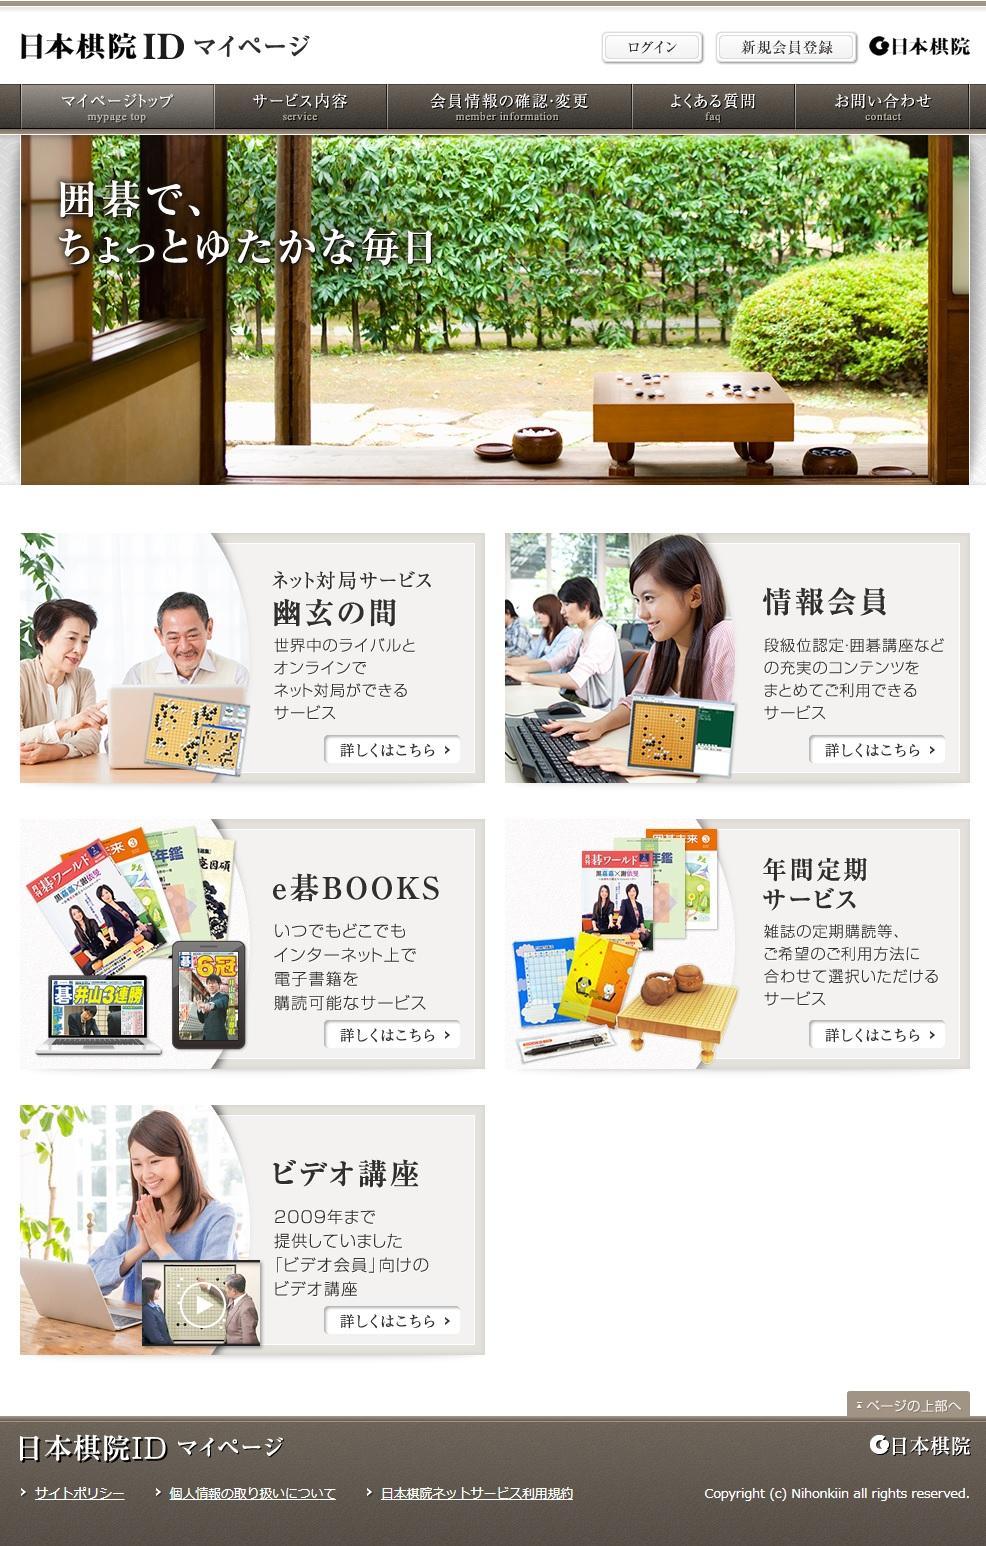 https://www.nihonkiin.or.jp/news/images/2017/mypagetop.jpg